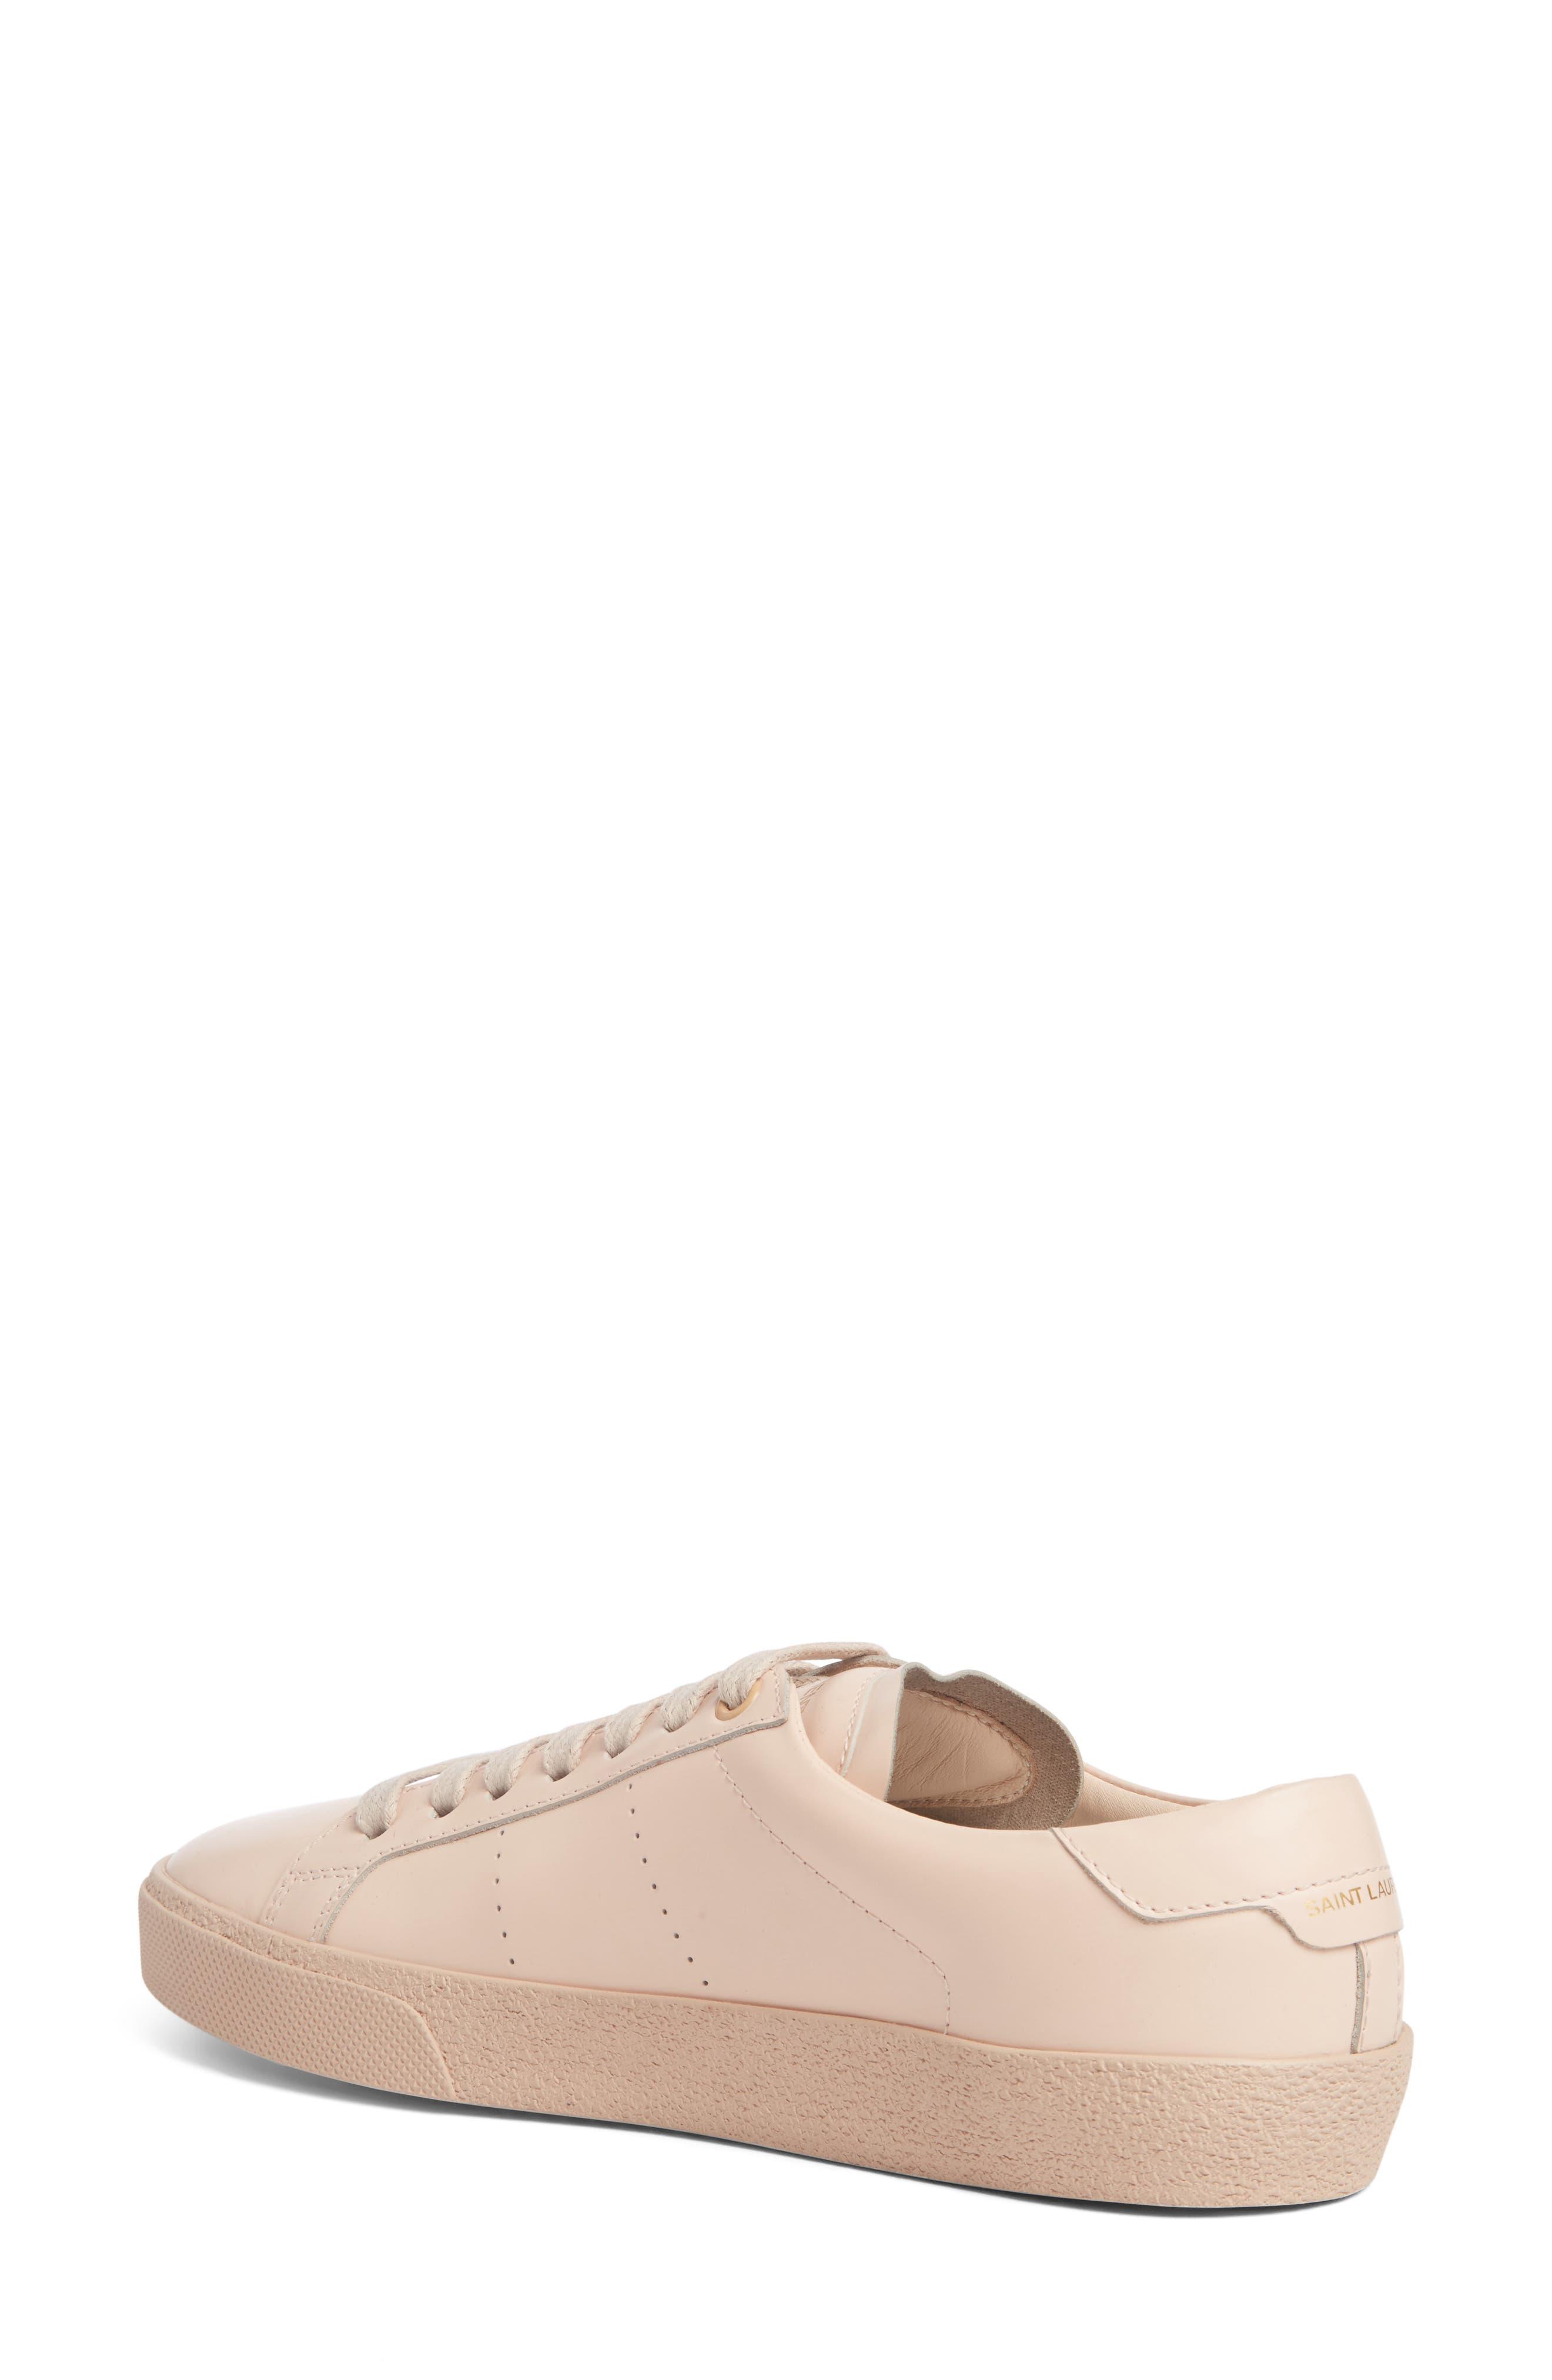 Alternate Image 2  - Saint Laurent Court Classic Sneaker (Women)